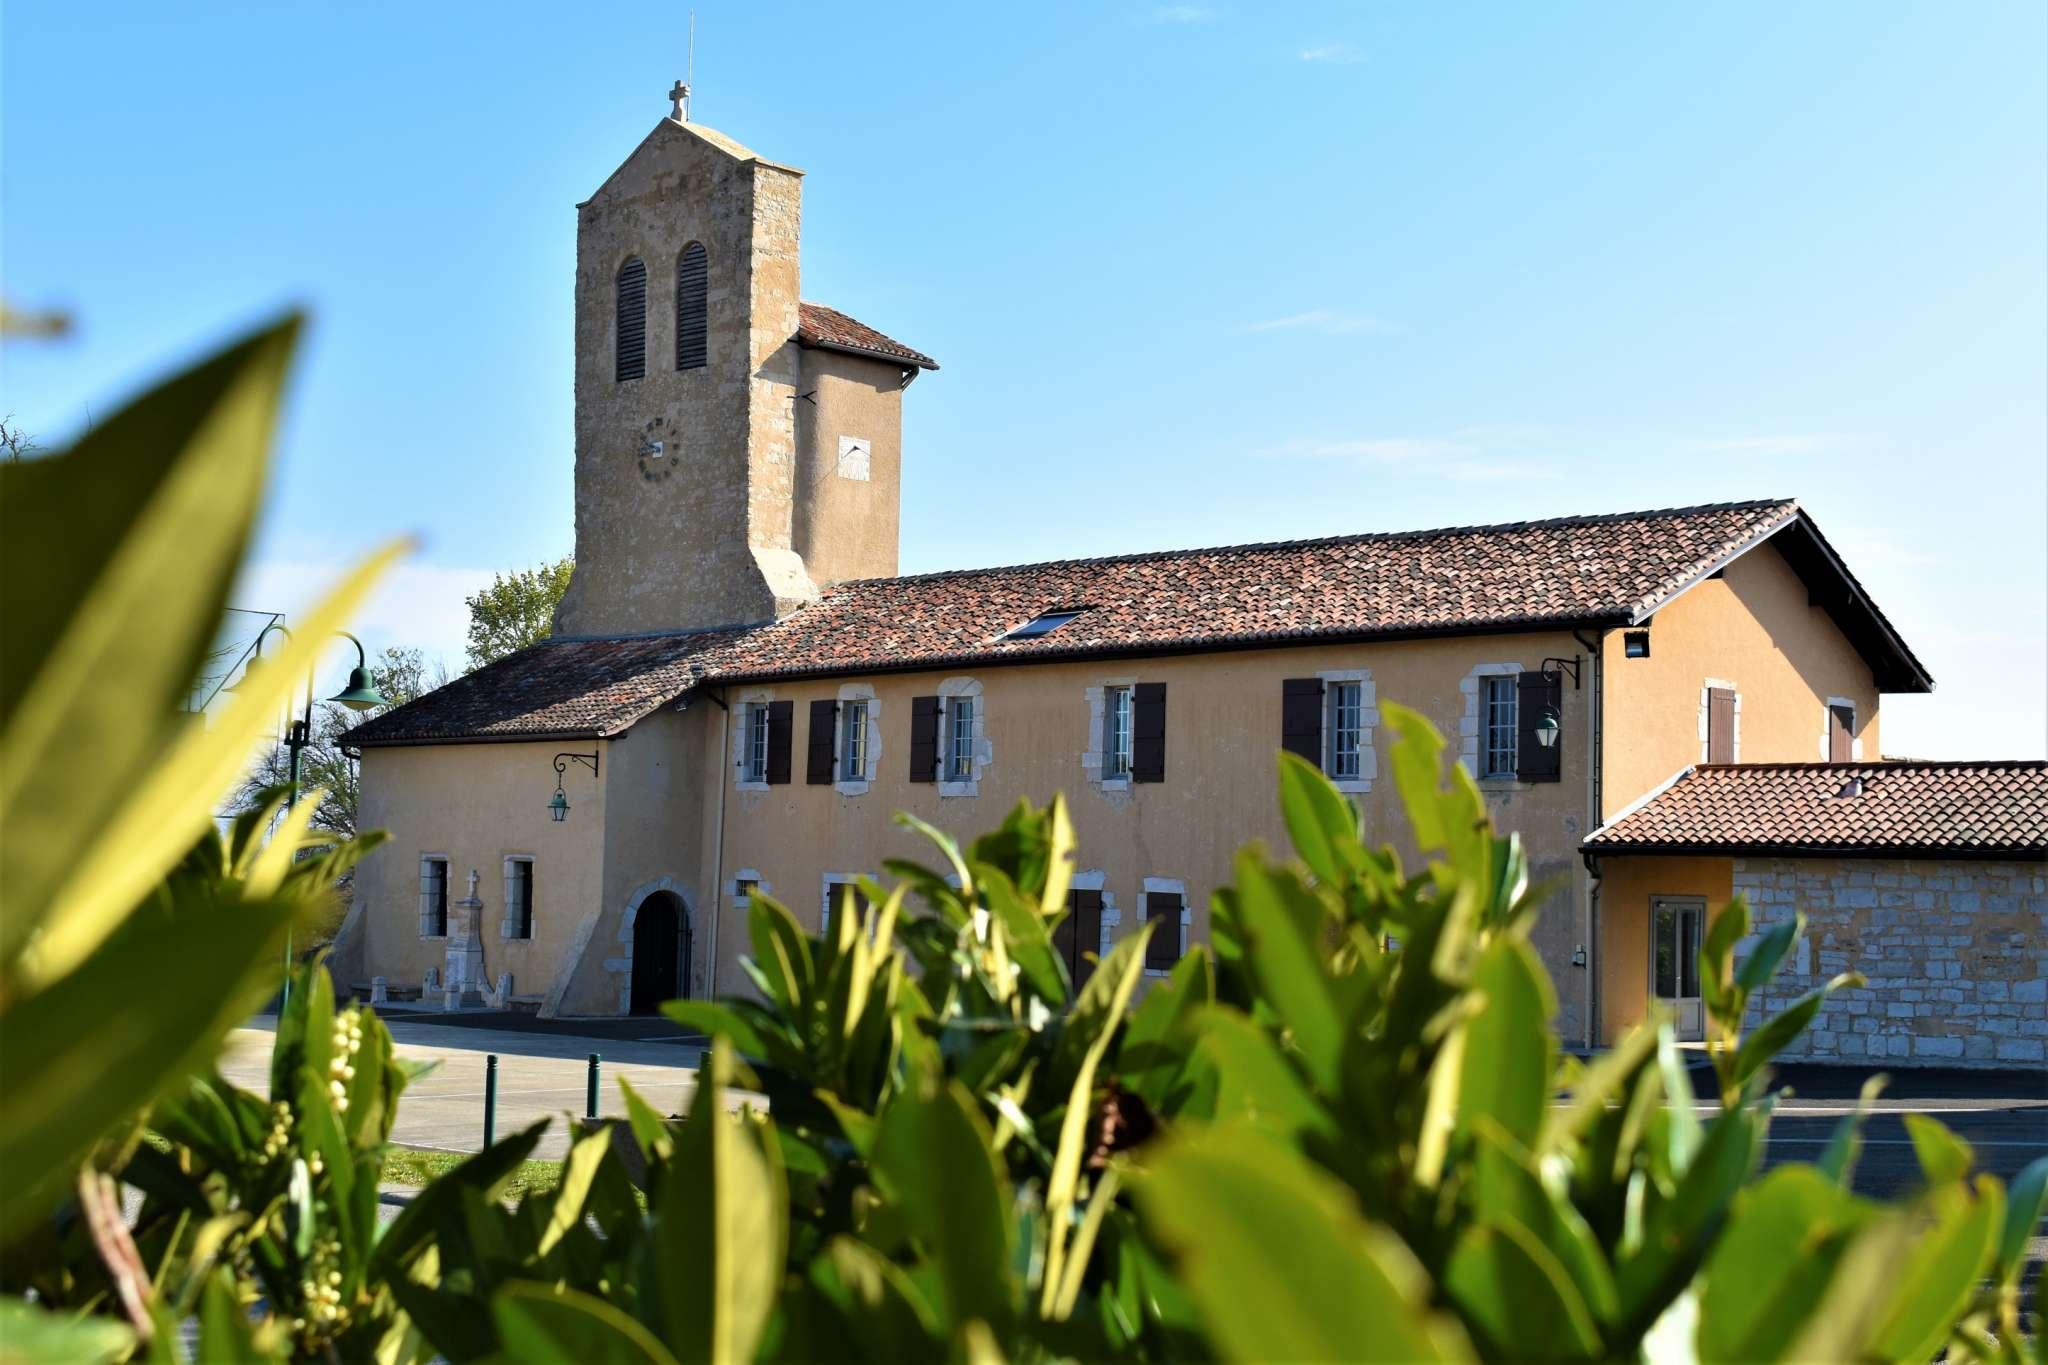 abbaye-de-lahonce2-otpb-valentin-grenon